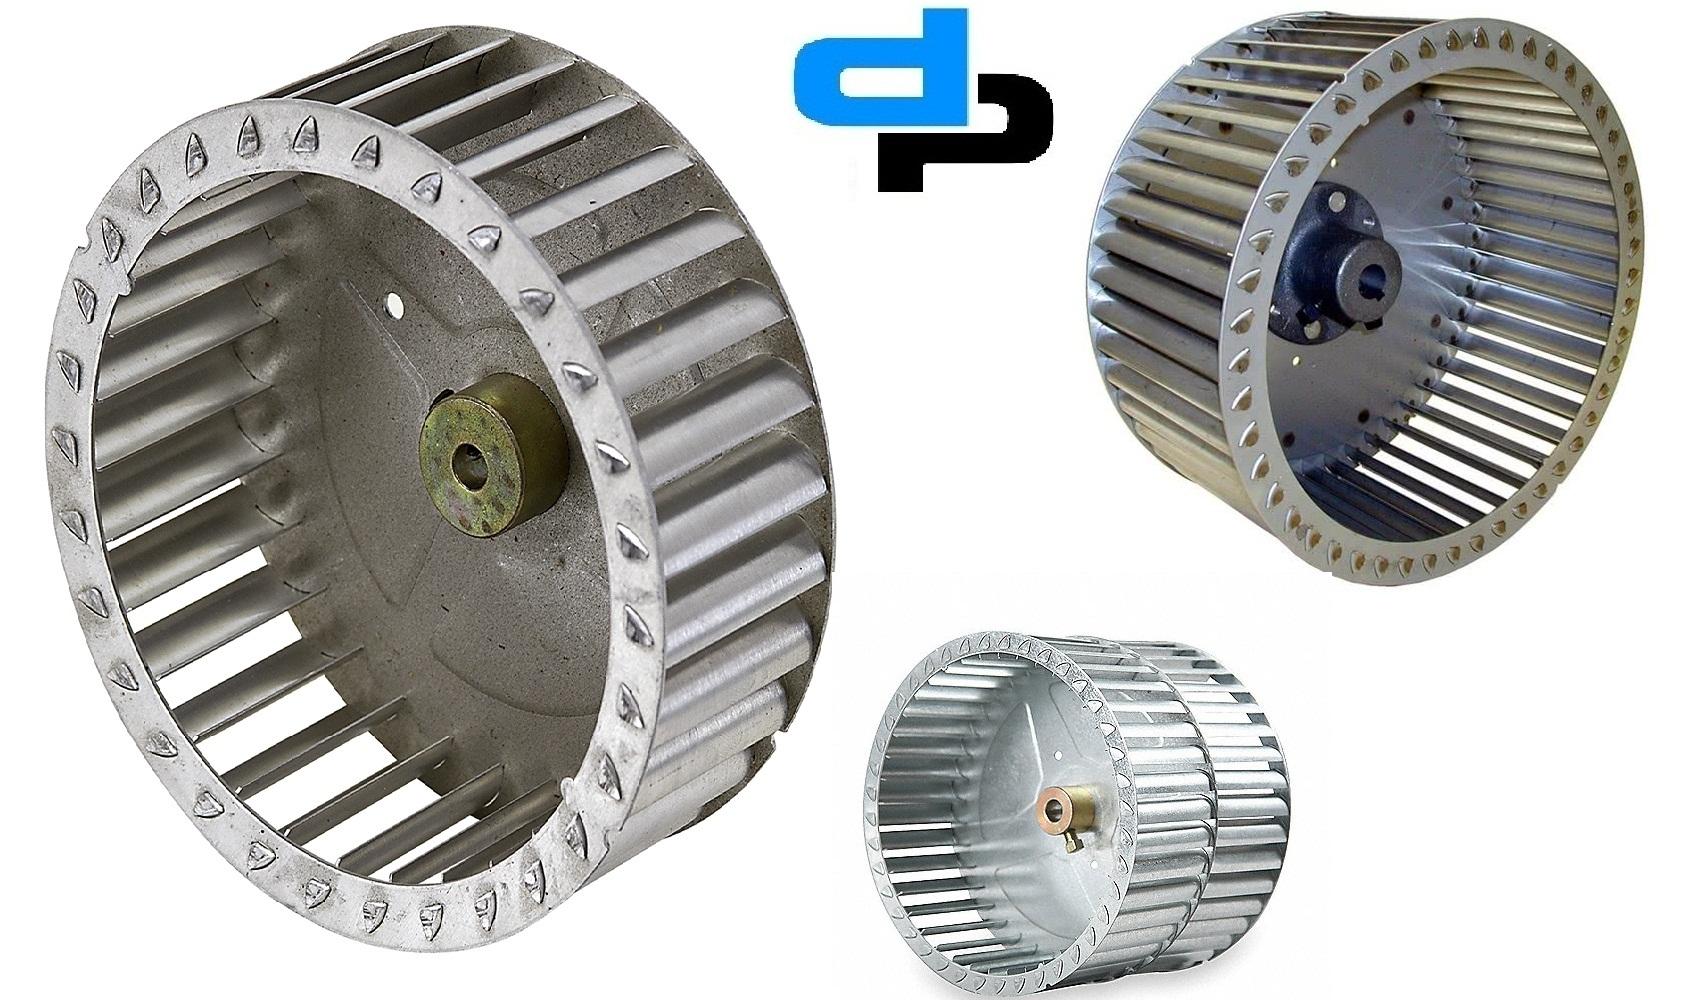 SISW Centrifugal Blower 200 MM X 75 MM